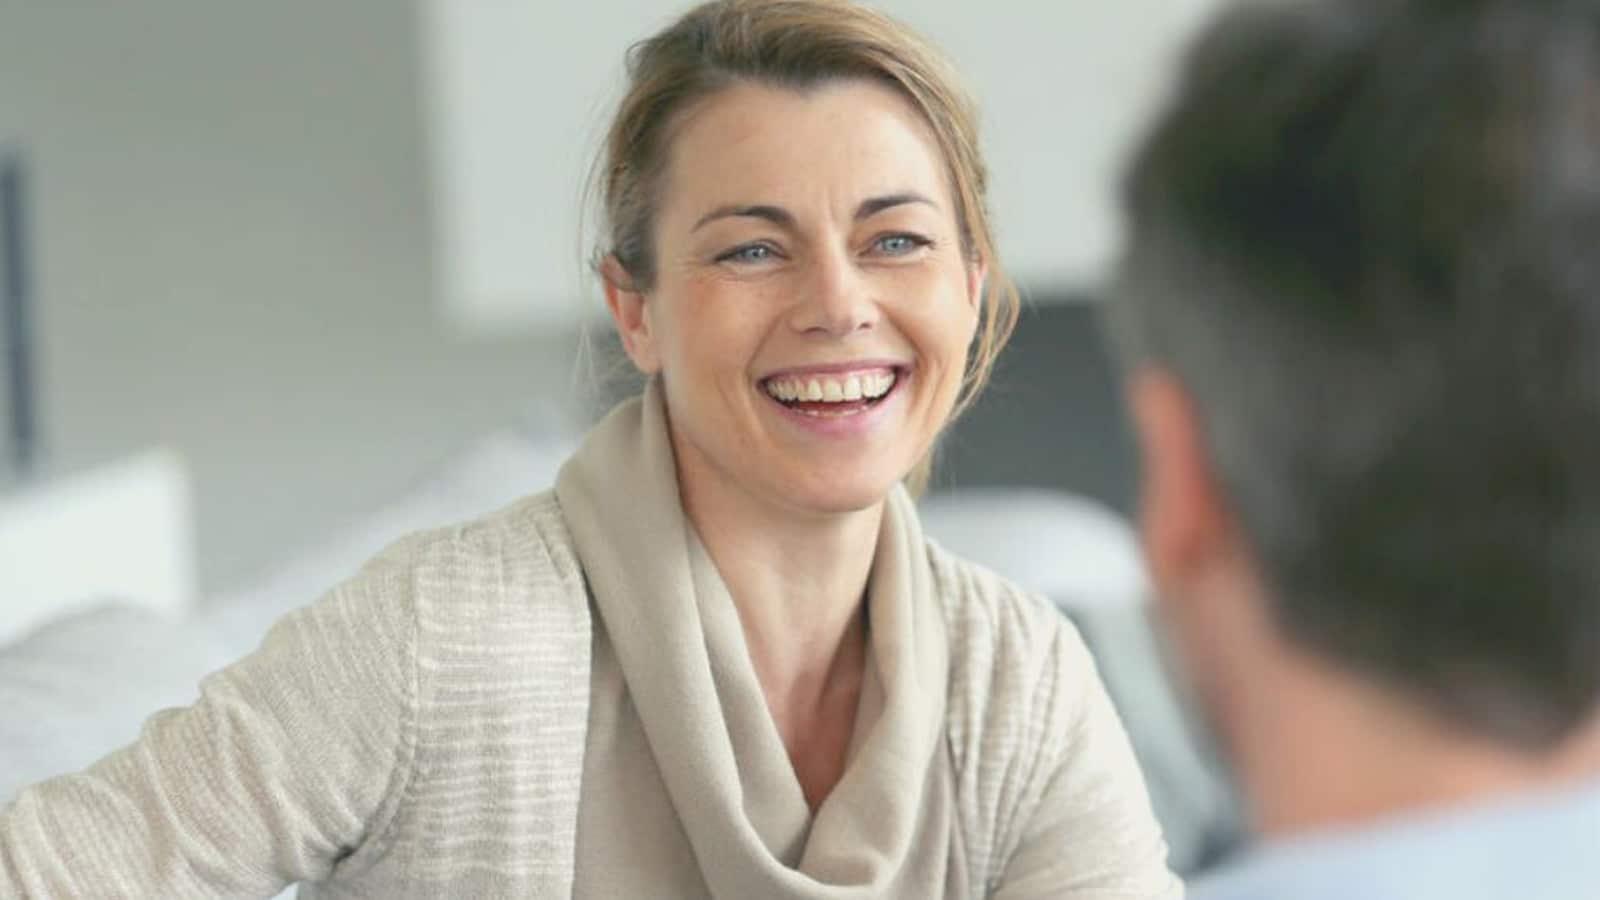 women-leadership-coaching-program-image-3a